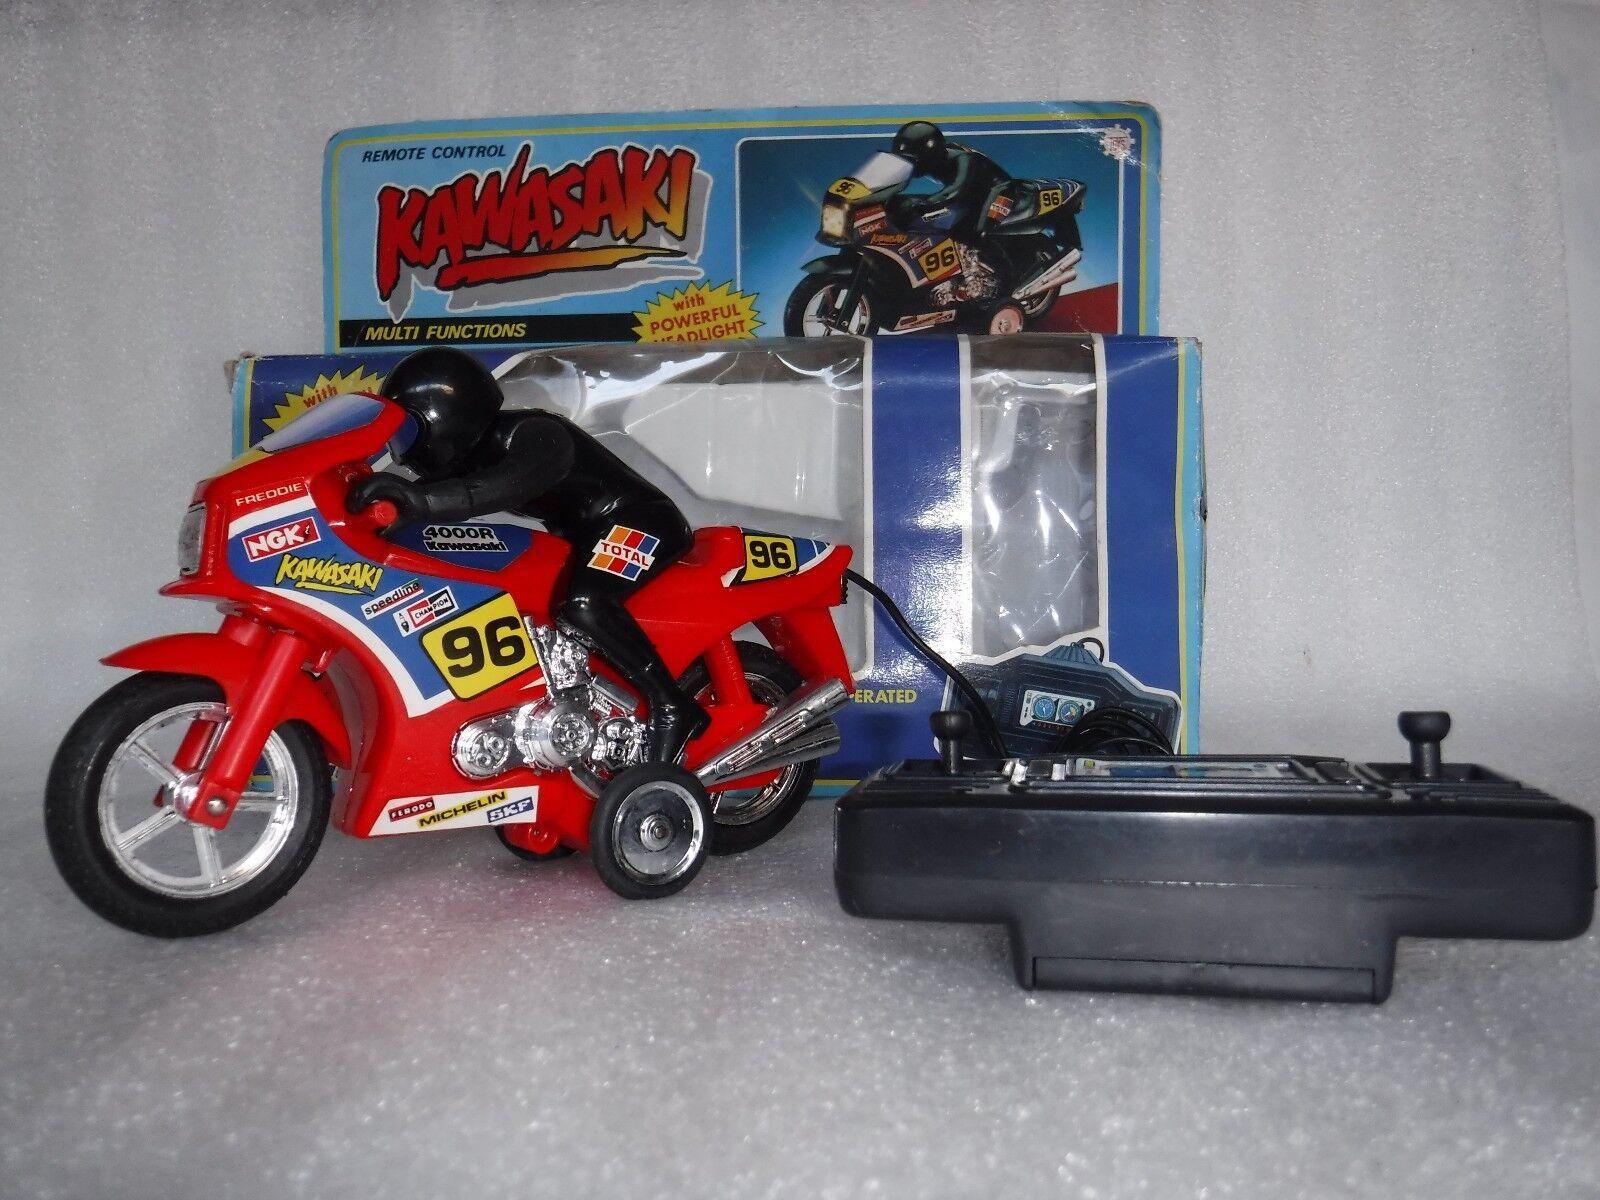 Rare  Vintage R C Kawasaki 4000R Racing Motorcycle bike Toy in Original Box